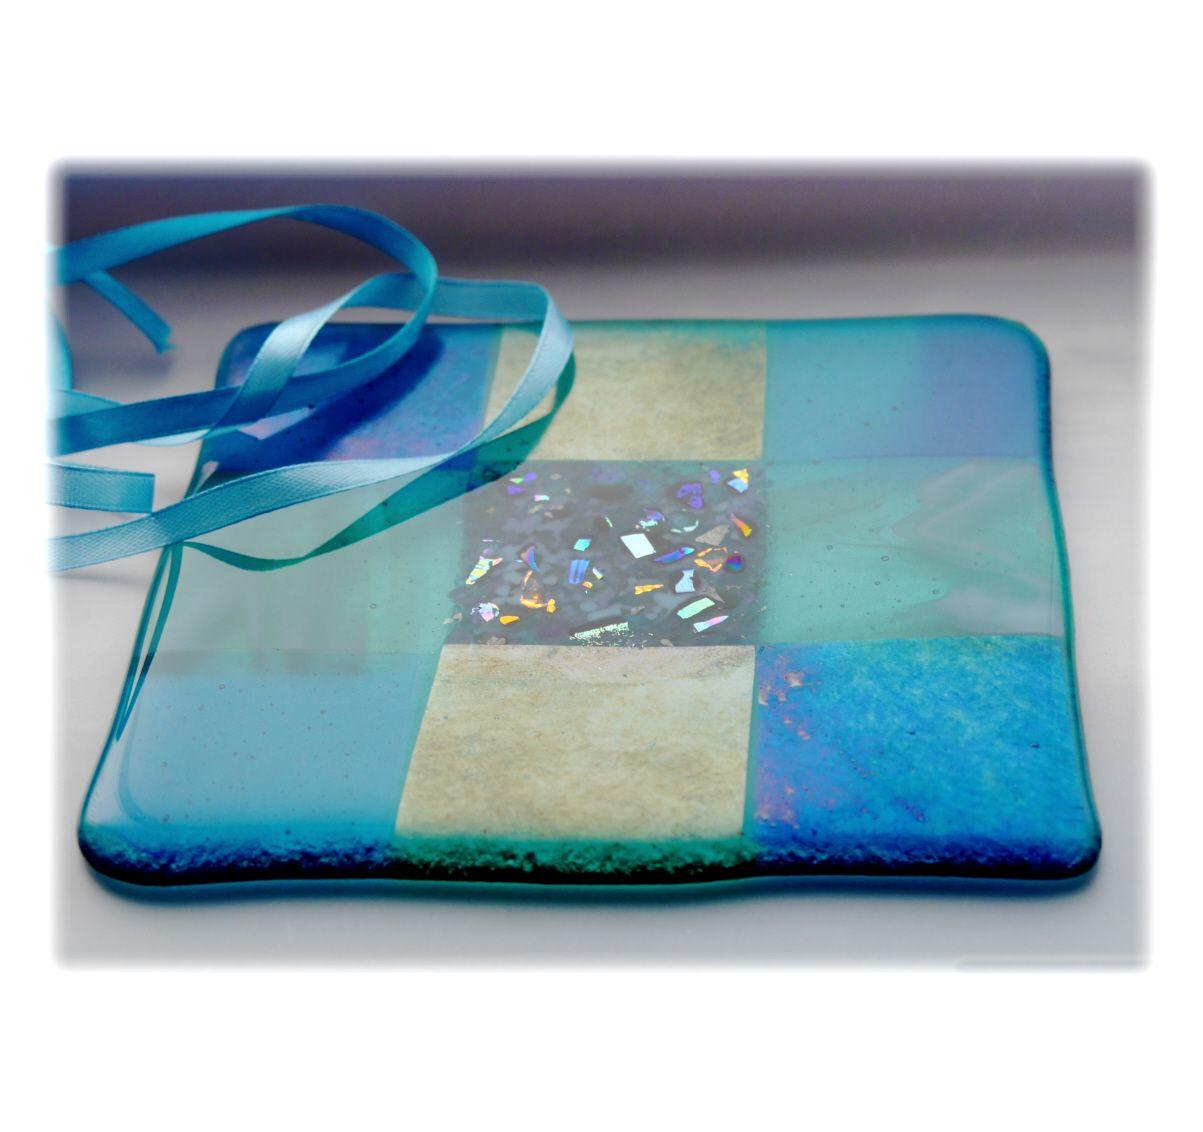 Trivet 16cm 006 turquoise #1708 @PRESENT JENNY @170929 @16.00